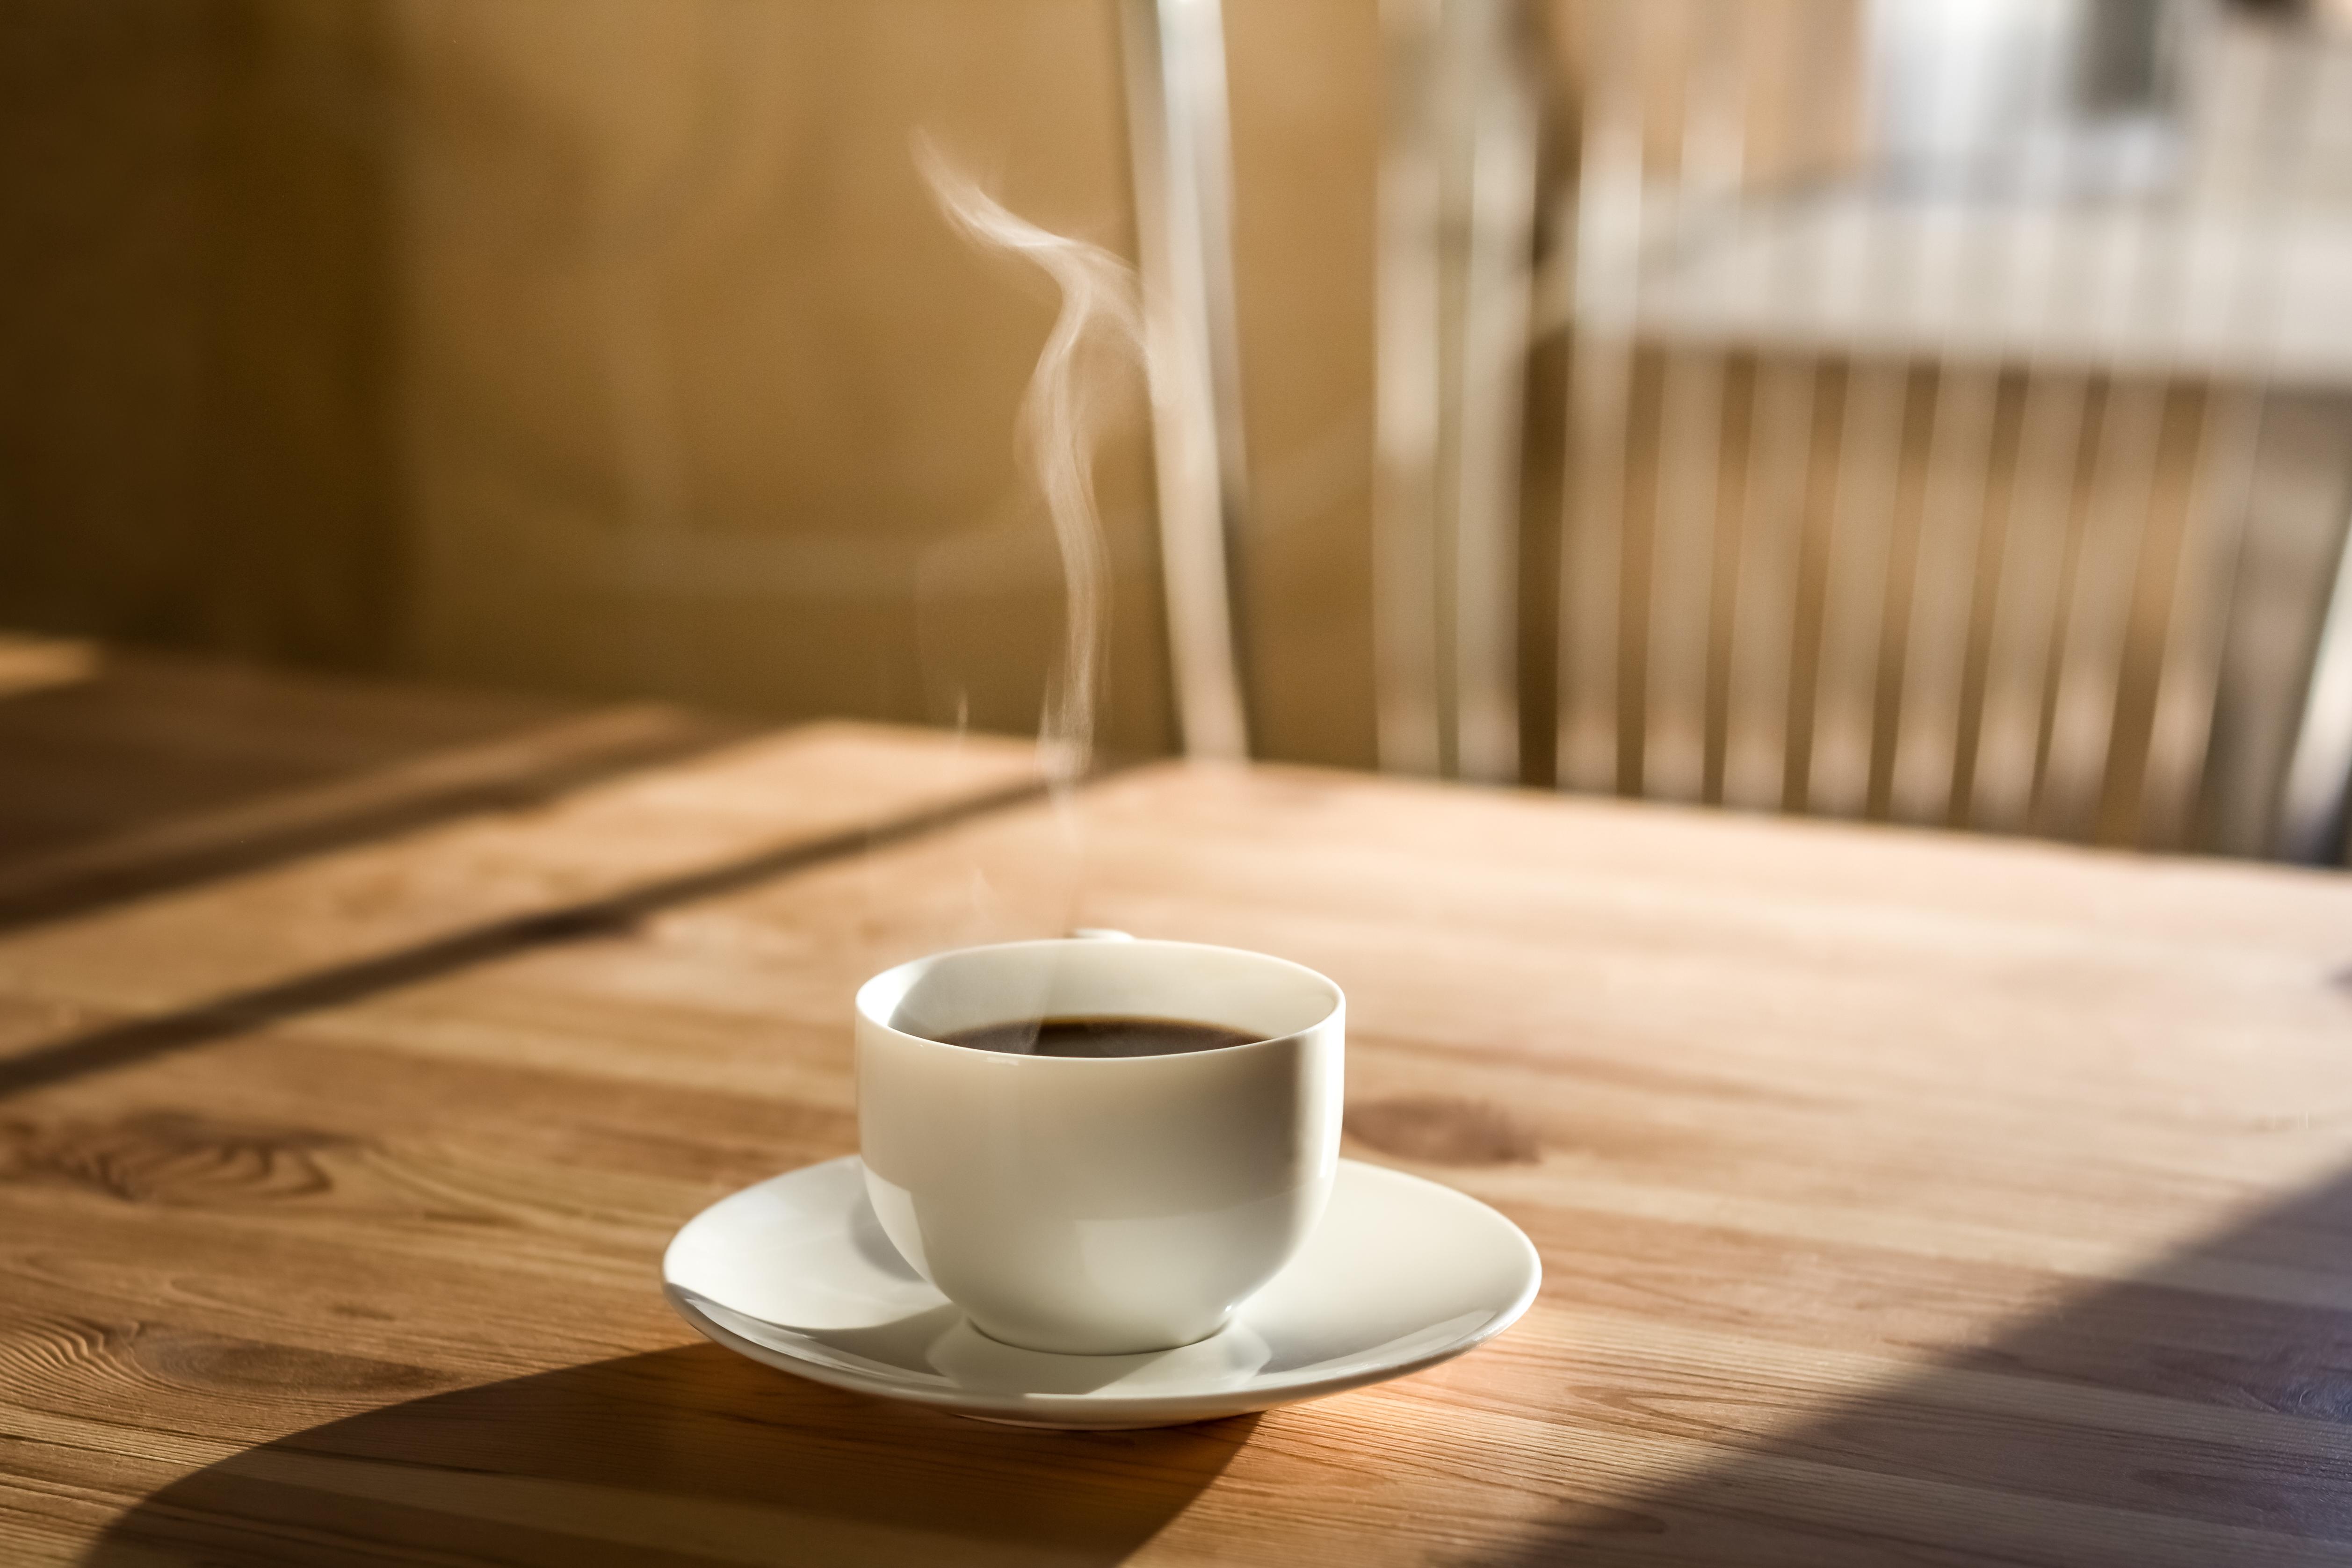 Pide un café rodeado de 'expertos' - Rusia Circuito Rusia Clásica y Helsinki